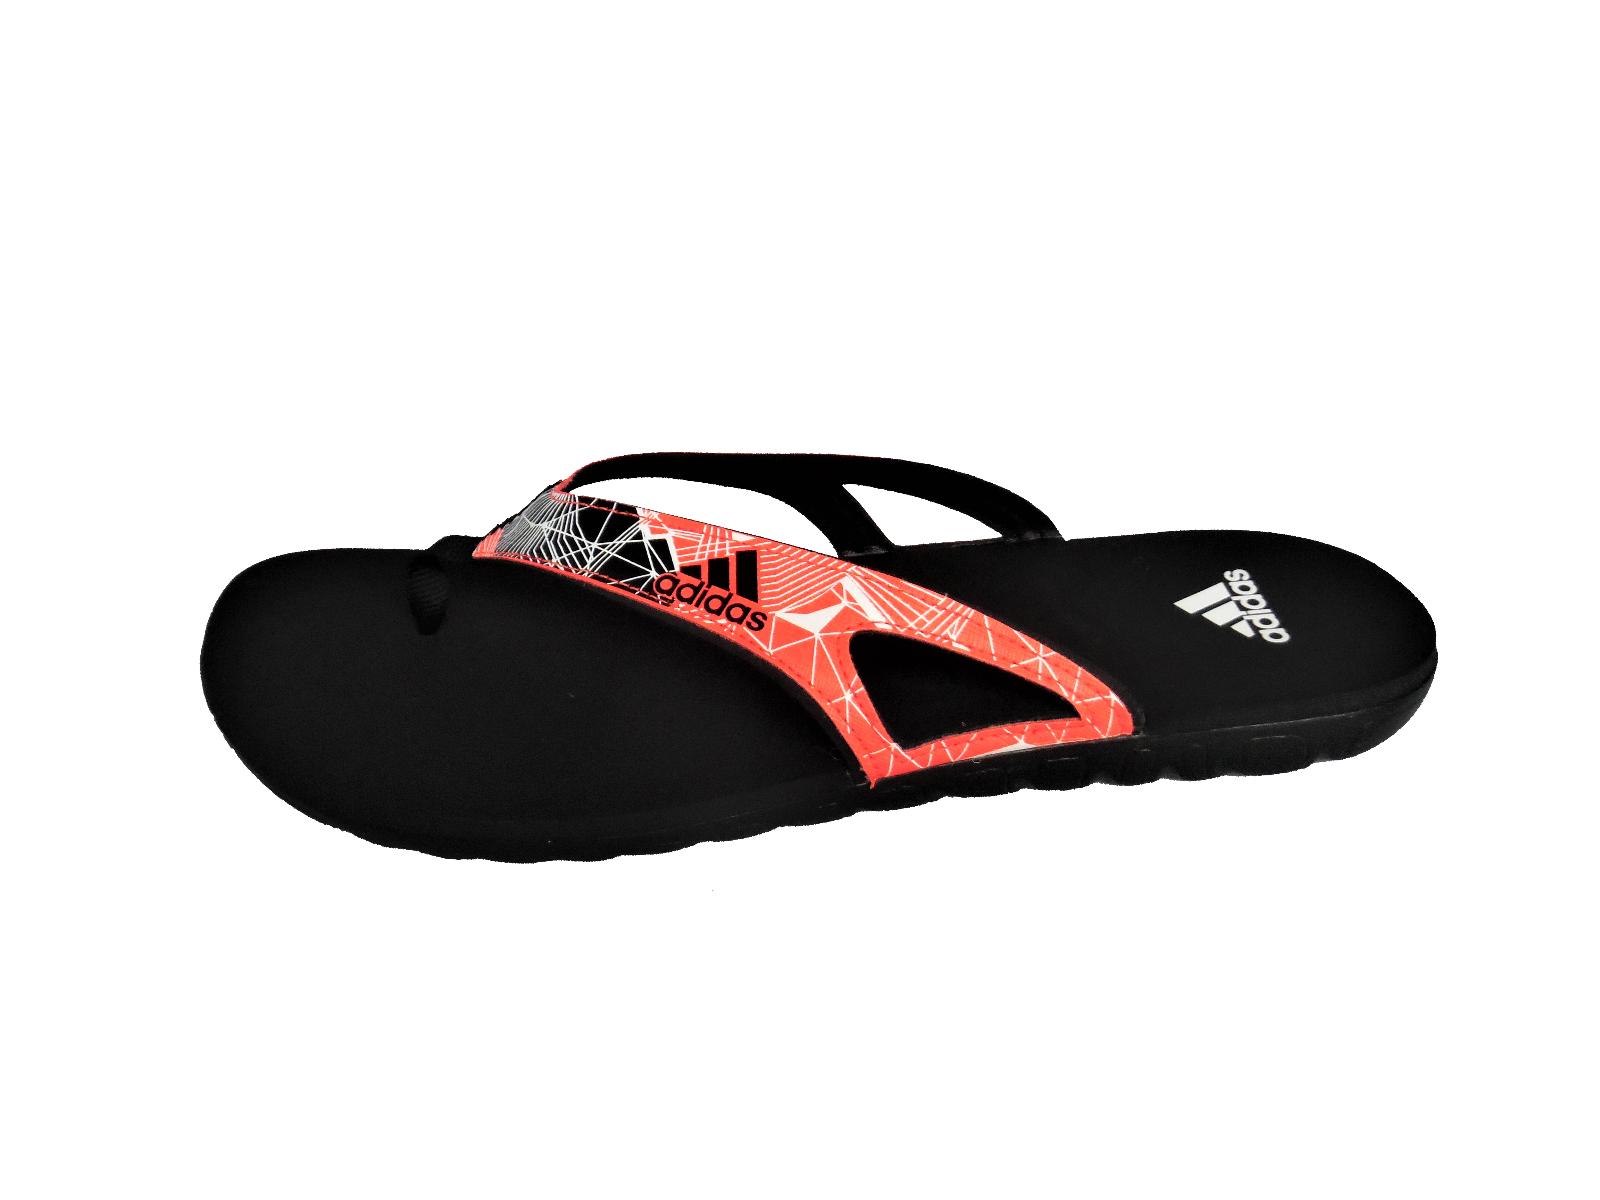 594f59d0b93a1 adidas Calo 5 Gr Men s Sandals Slippers Slides Flip Flops UK 10 ...